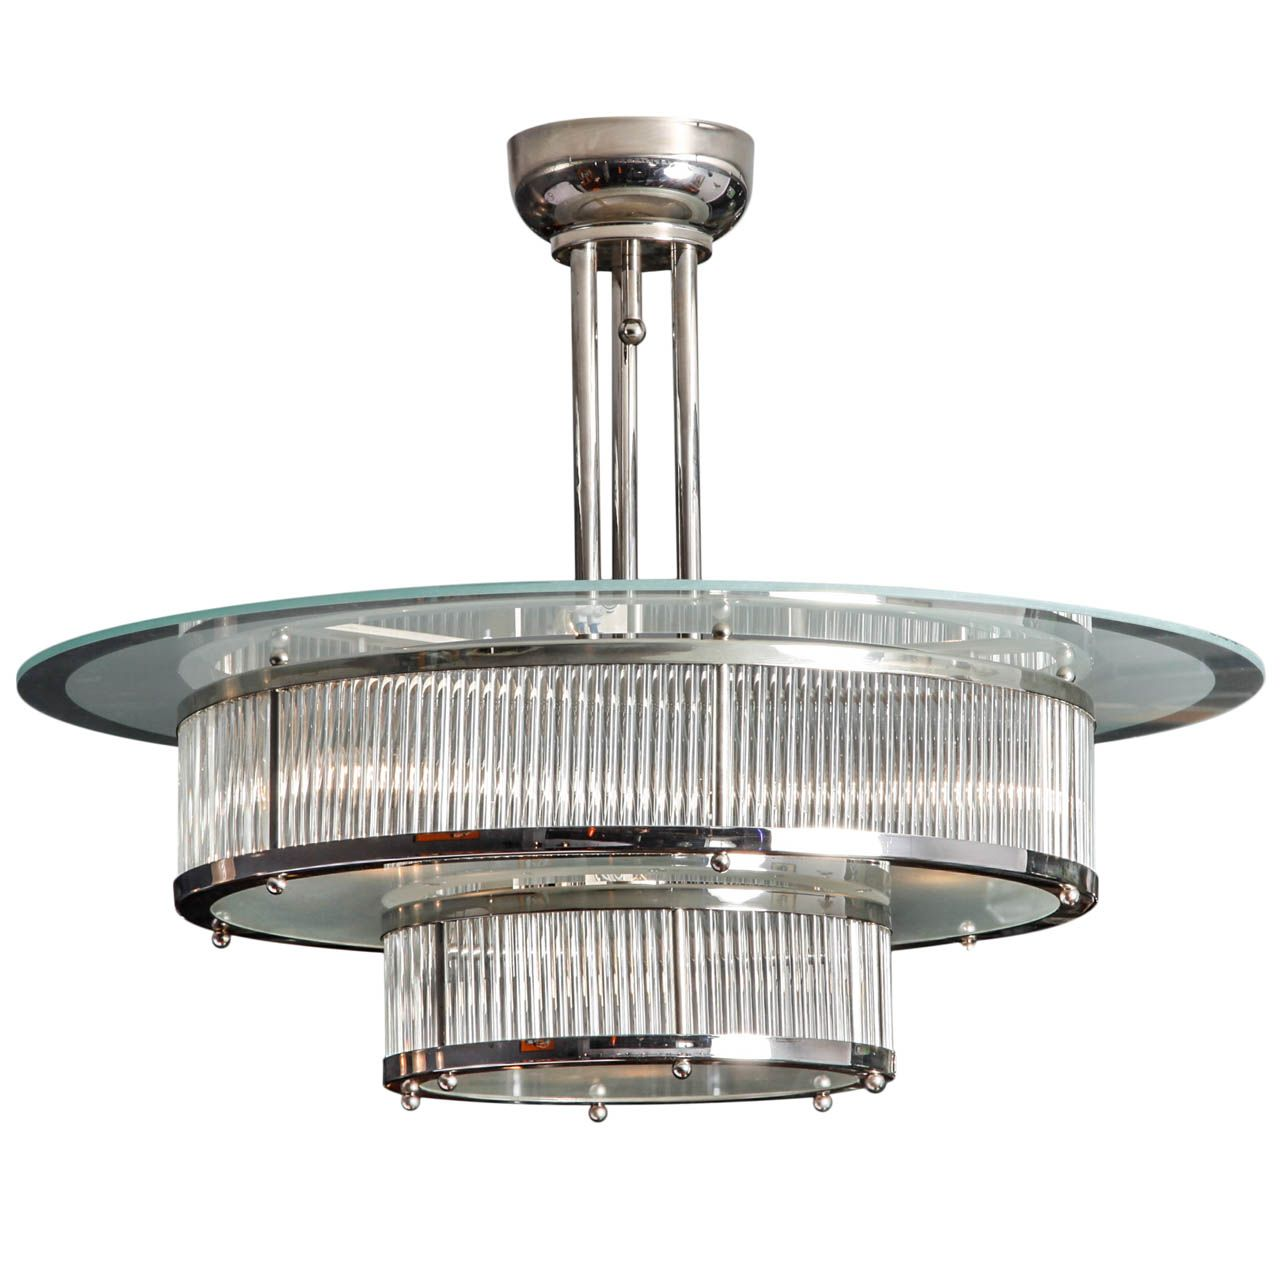 Art deco chandelier france 1930 art deco pinterest candelabros iluminaci n y decoraci n - Art deco decoracion ...